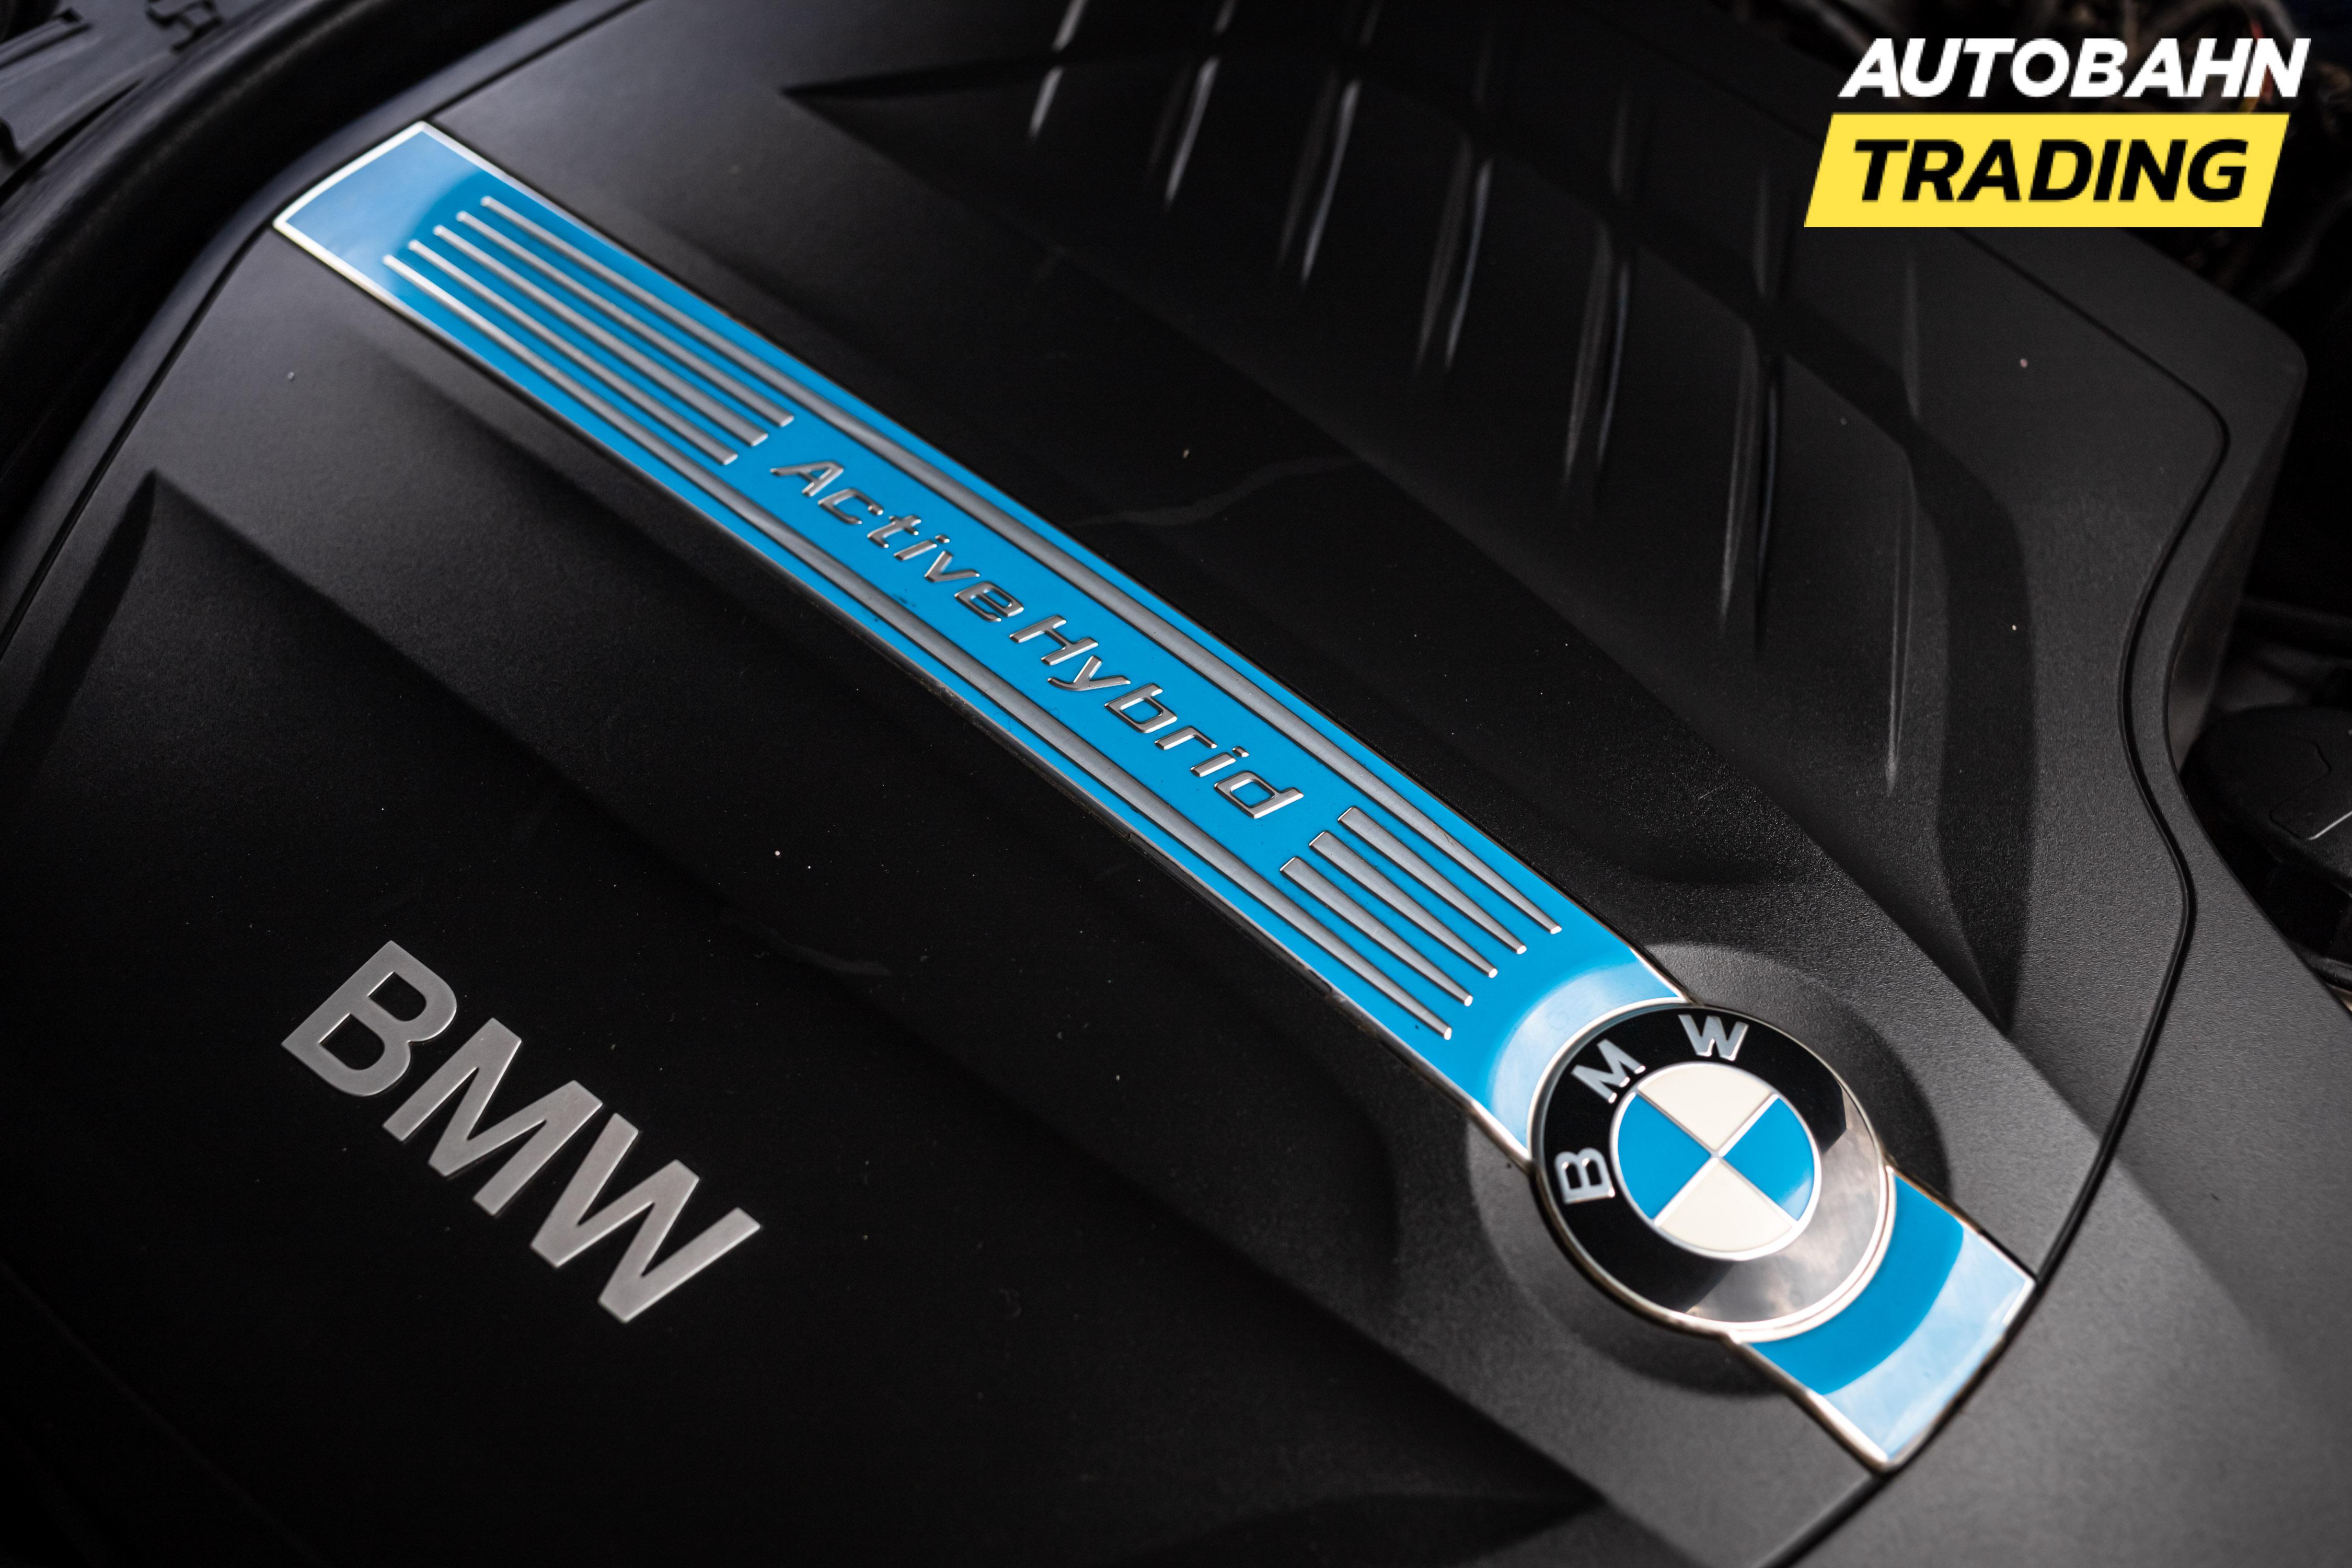 2013 BMW Active Hybrid 3 (F30) AT full